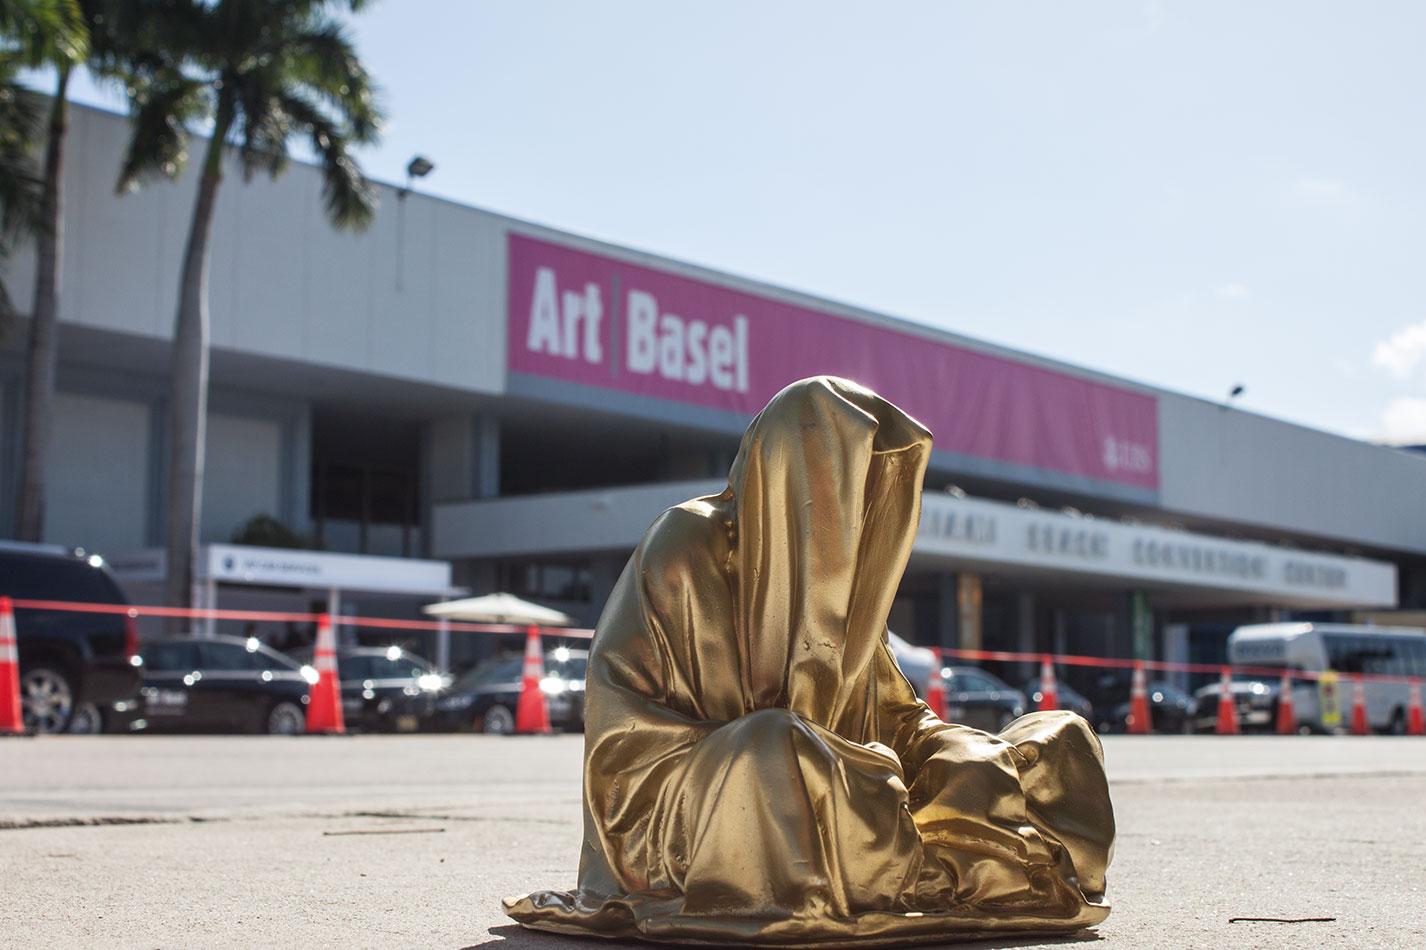 public-art-basel-miami-beach-fair-usa-florida-bass-museum-guardians-of-time-manfred-kili-kielnhofer-contemporary-fine-art-modern-arts-design-antiques-sculpture-6470